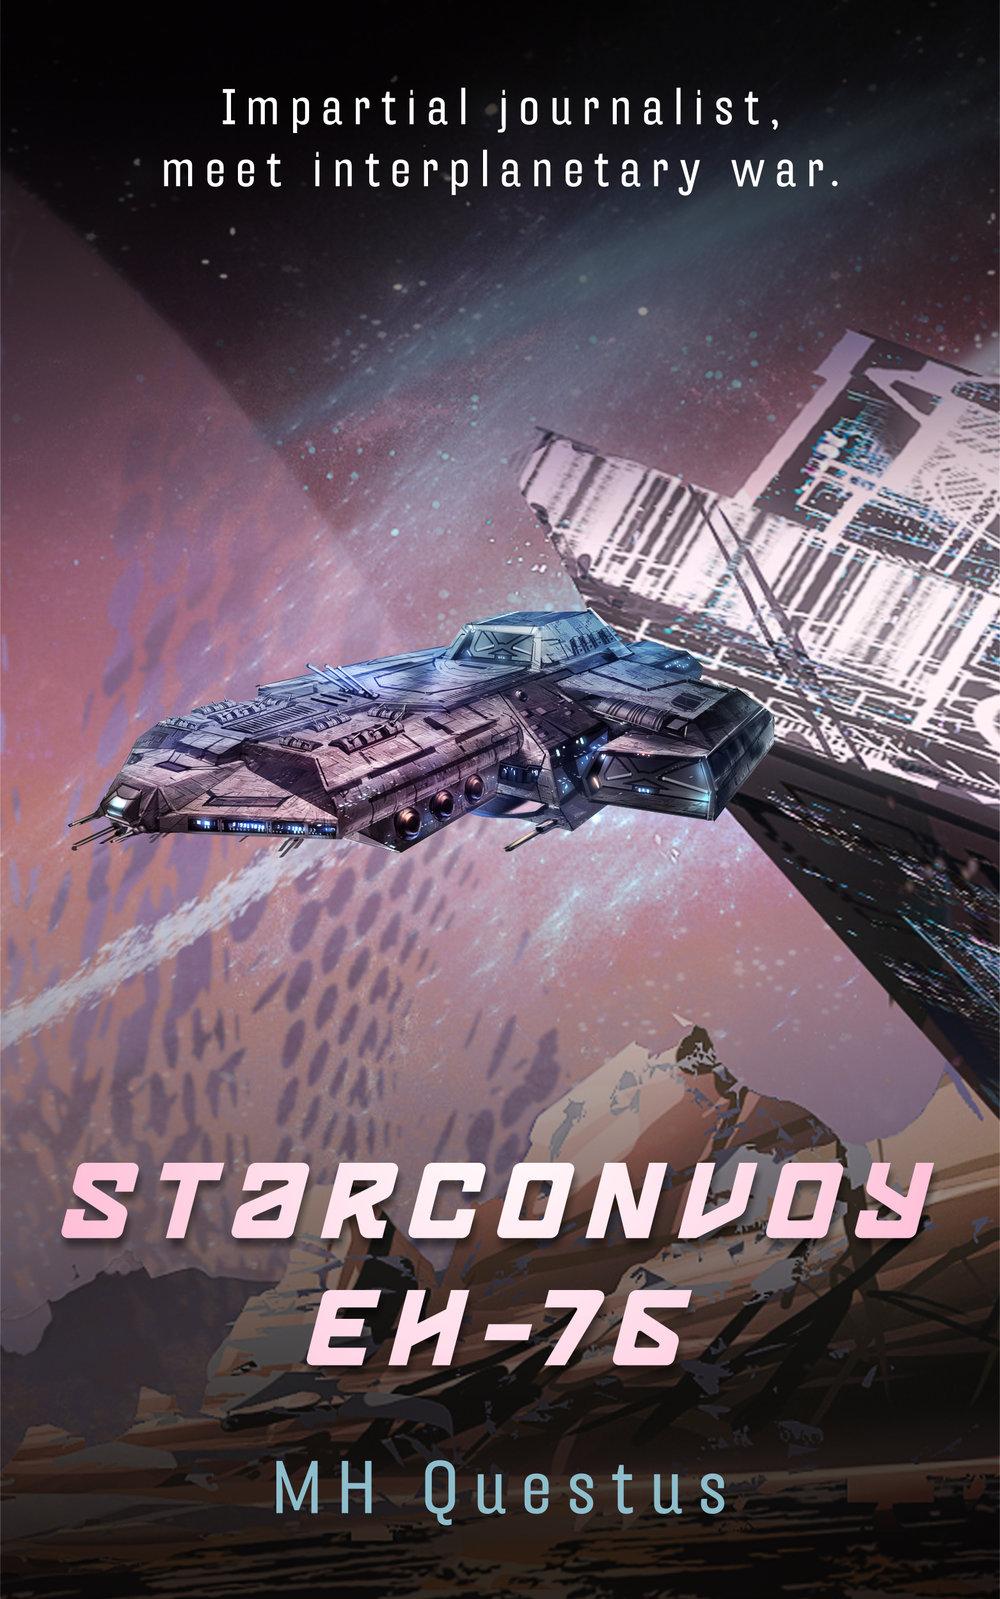 Starconvoy EH-76 - High Resolution.jpg